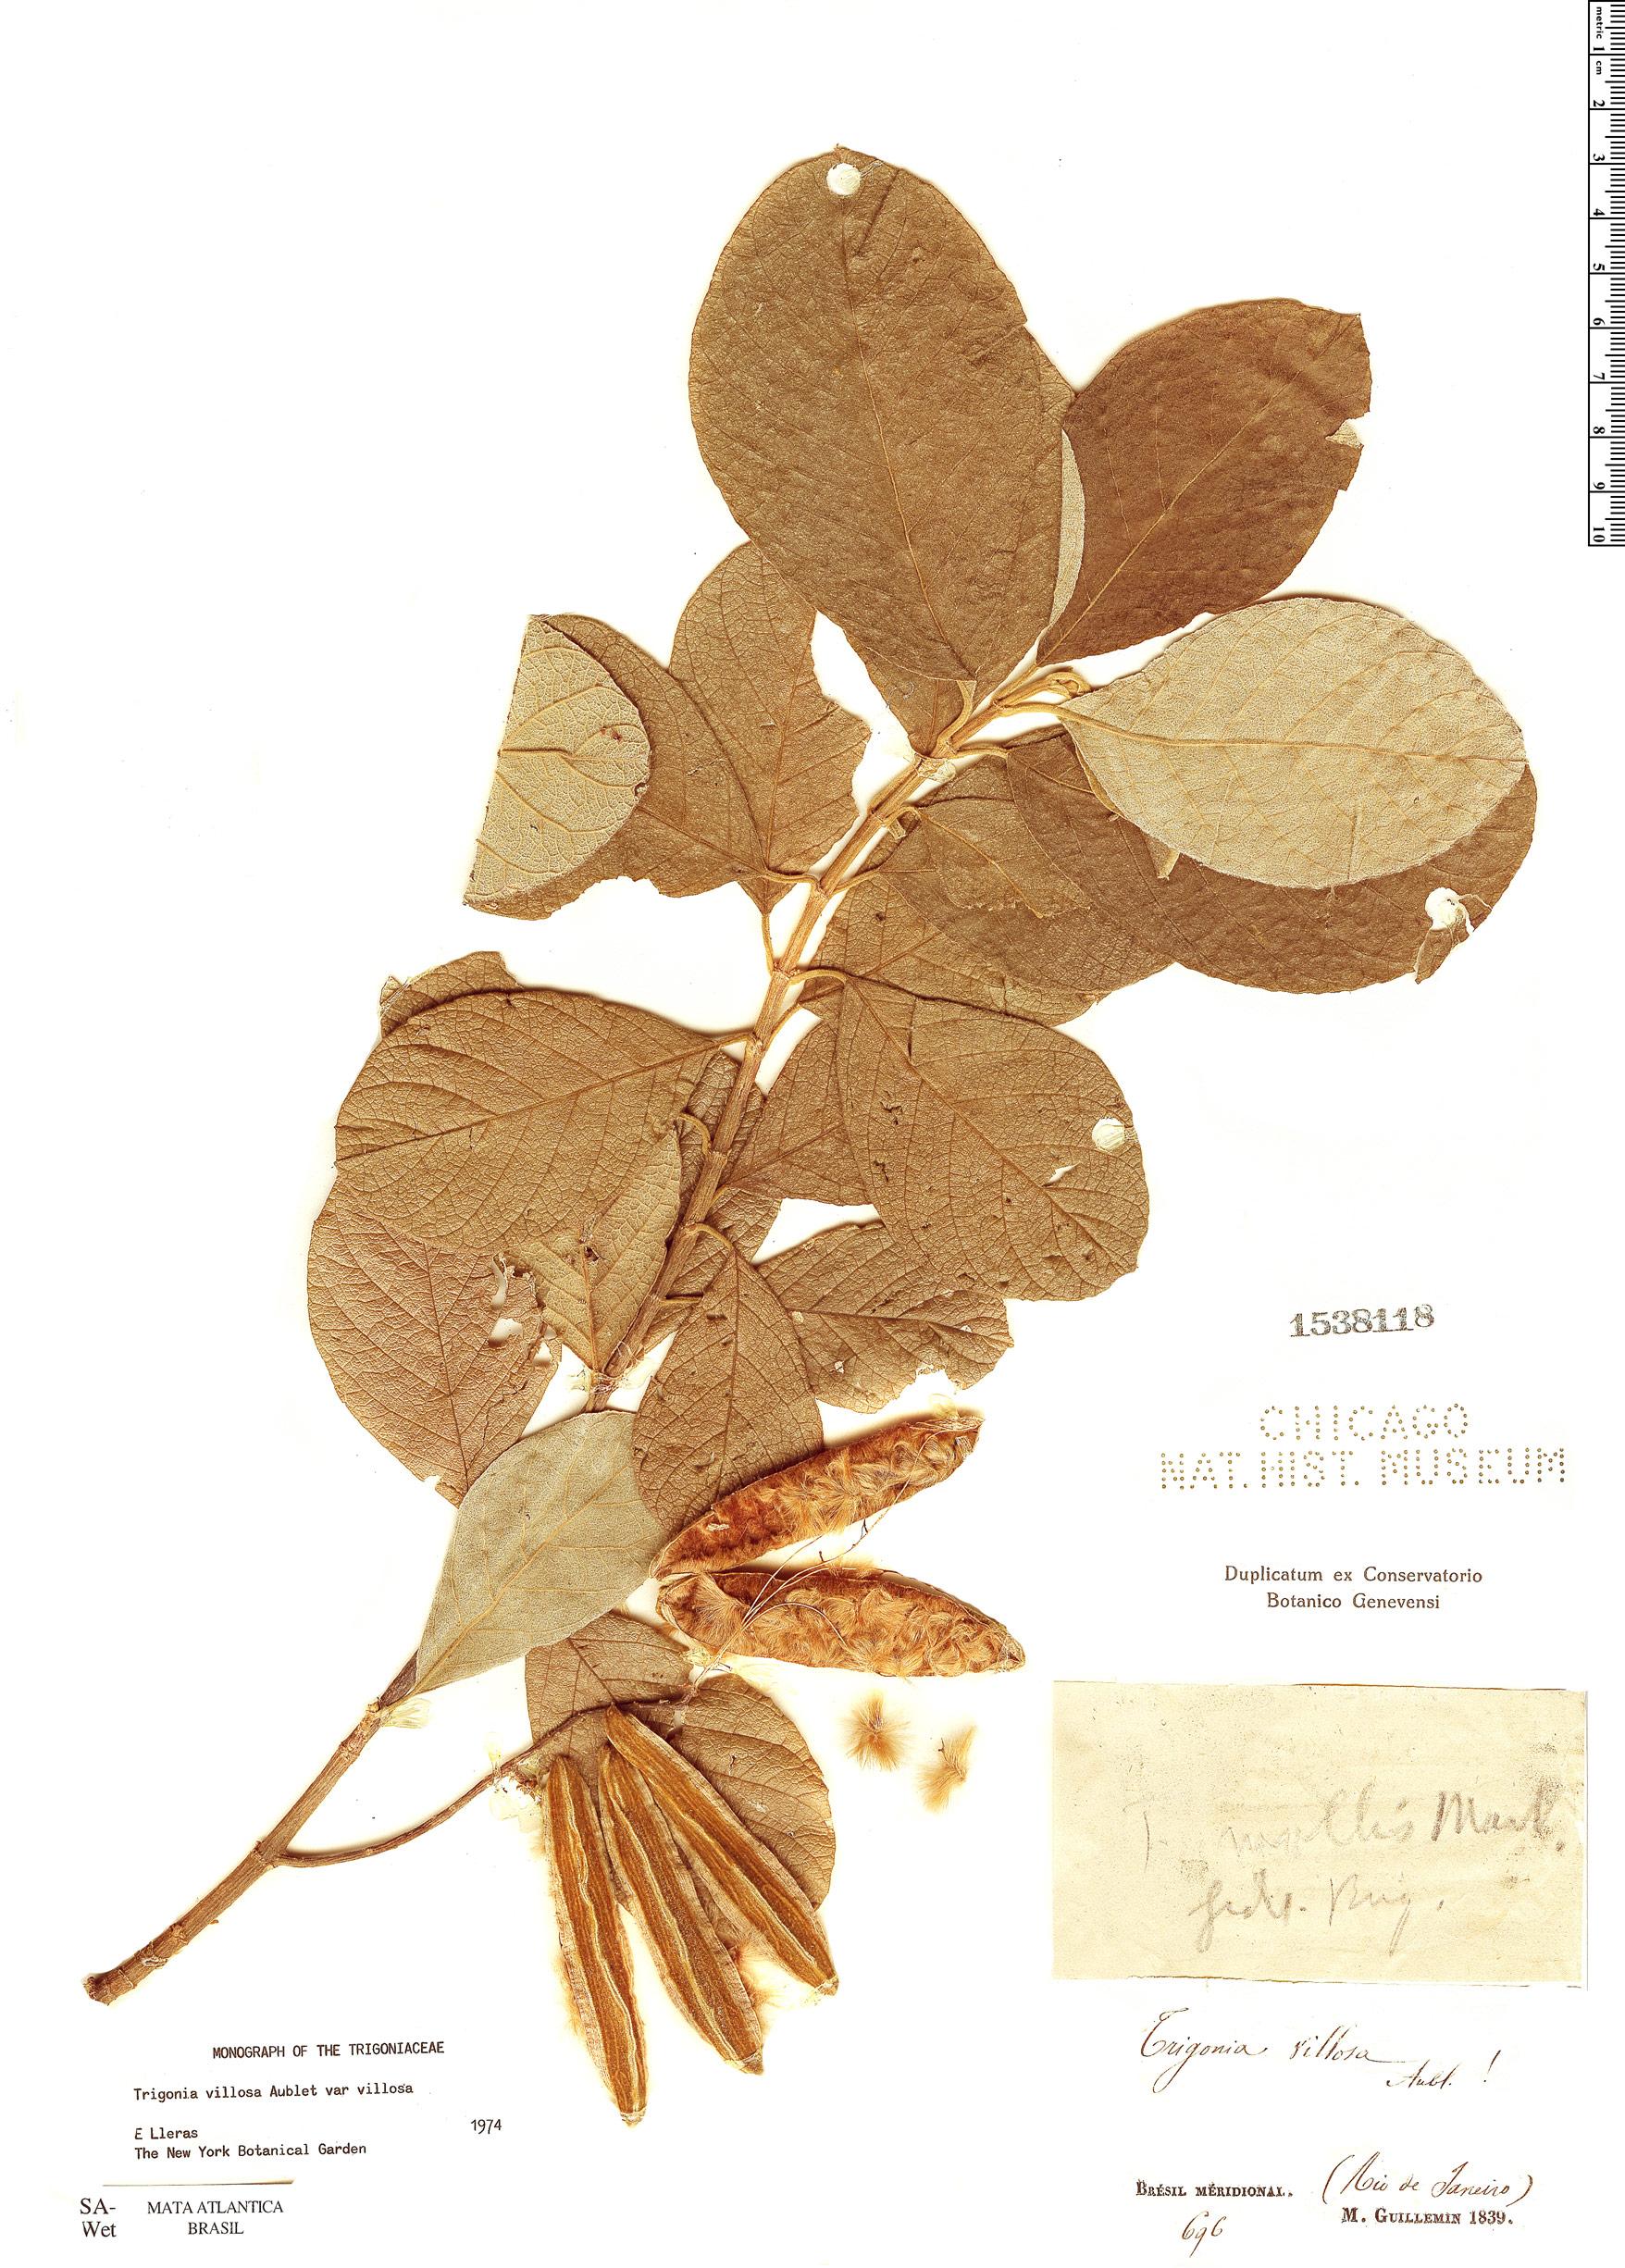 Espécimen: Trigonia villosa